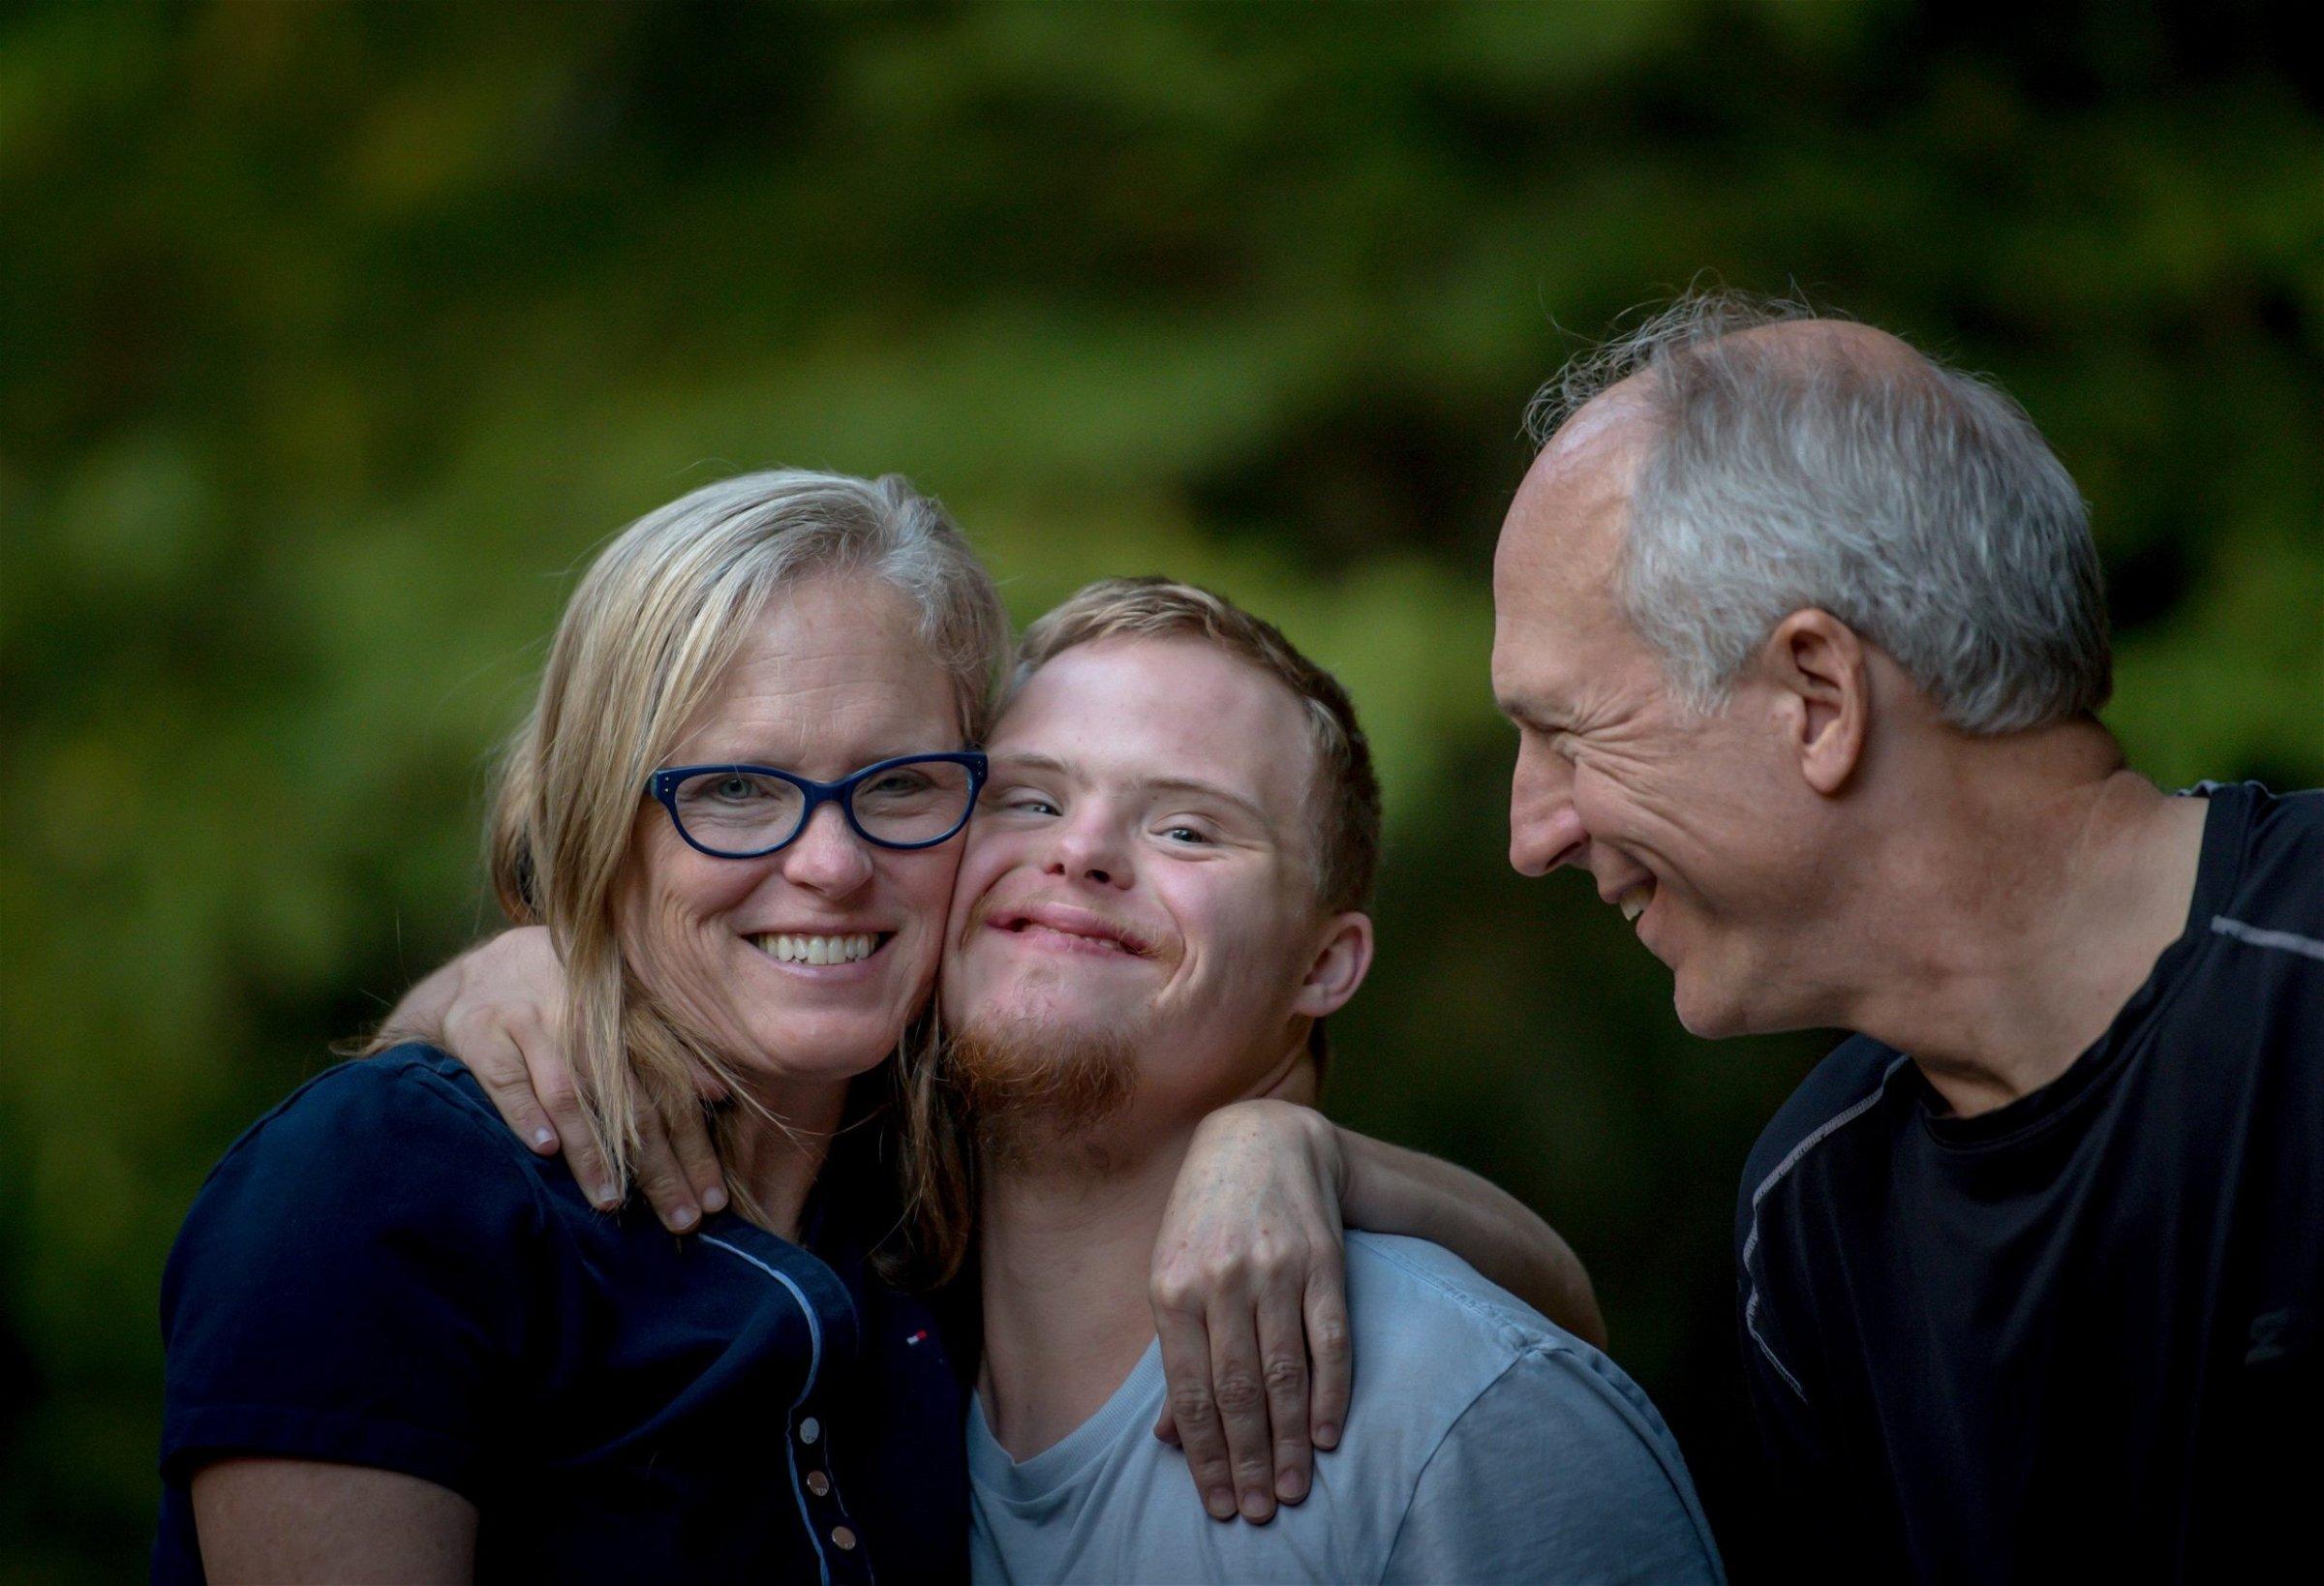 parents embracing adult child